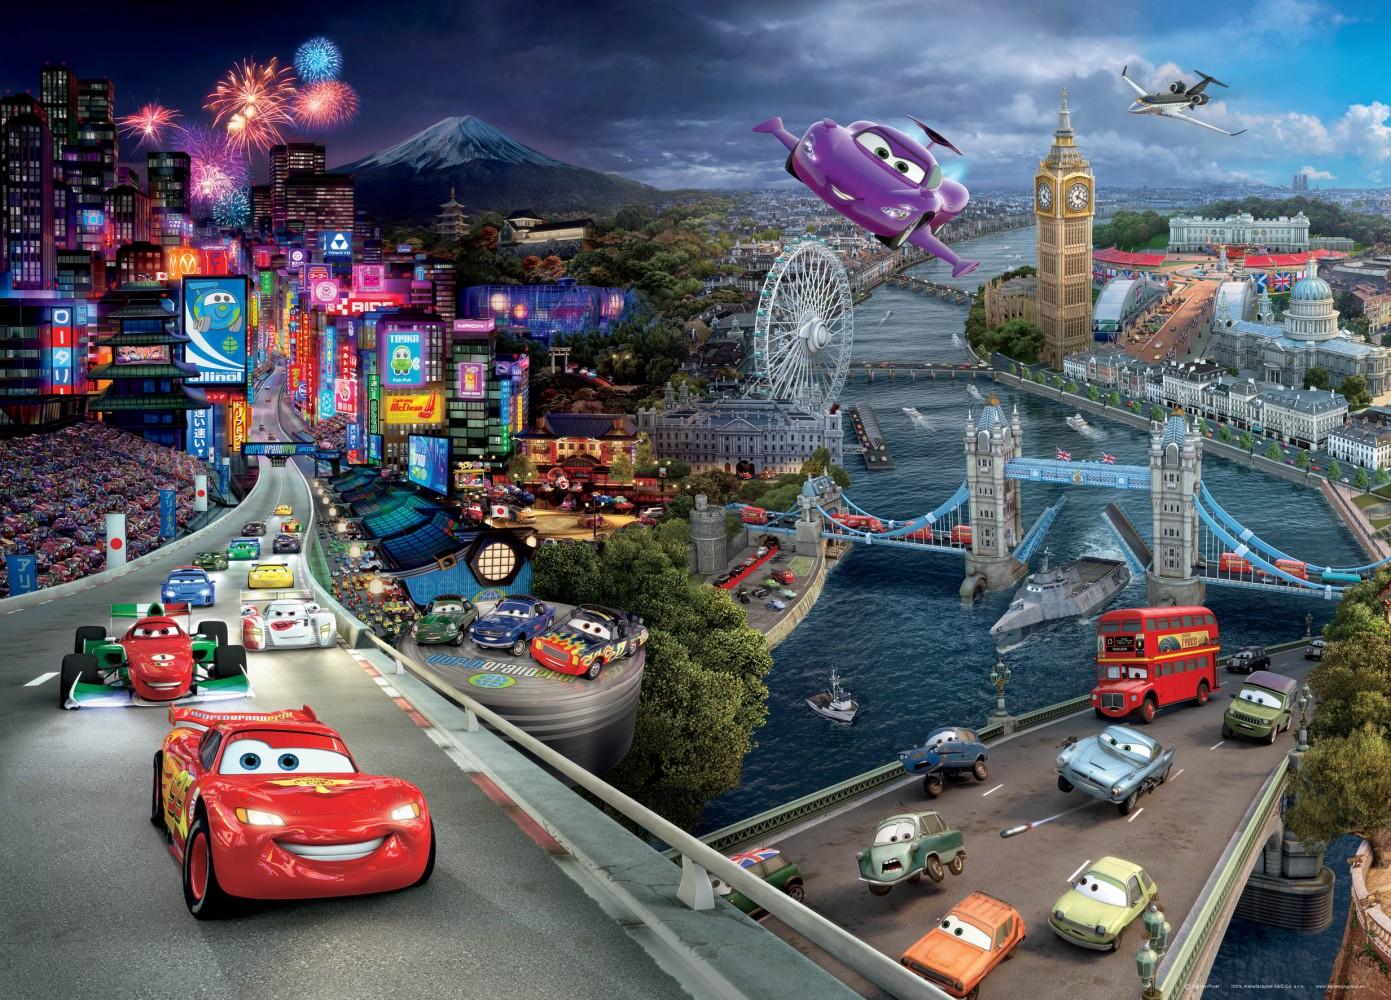 XXL Poster Fototapete Tapete Disney Pixxar Cars 2 Cars ...